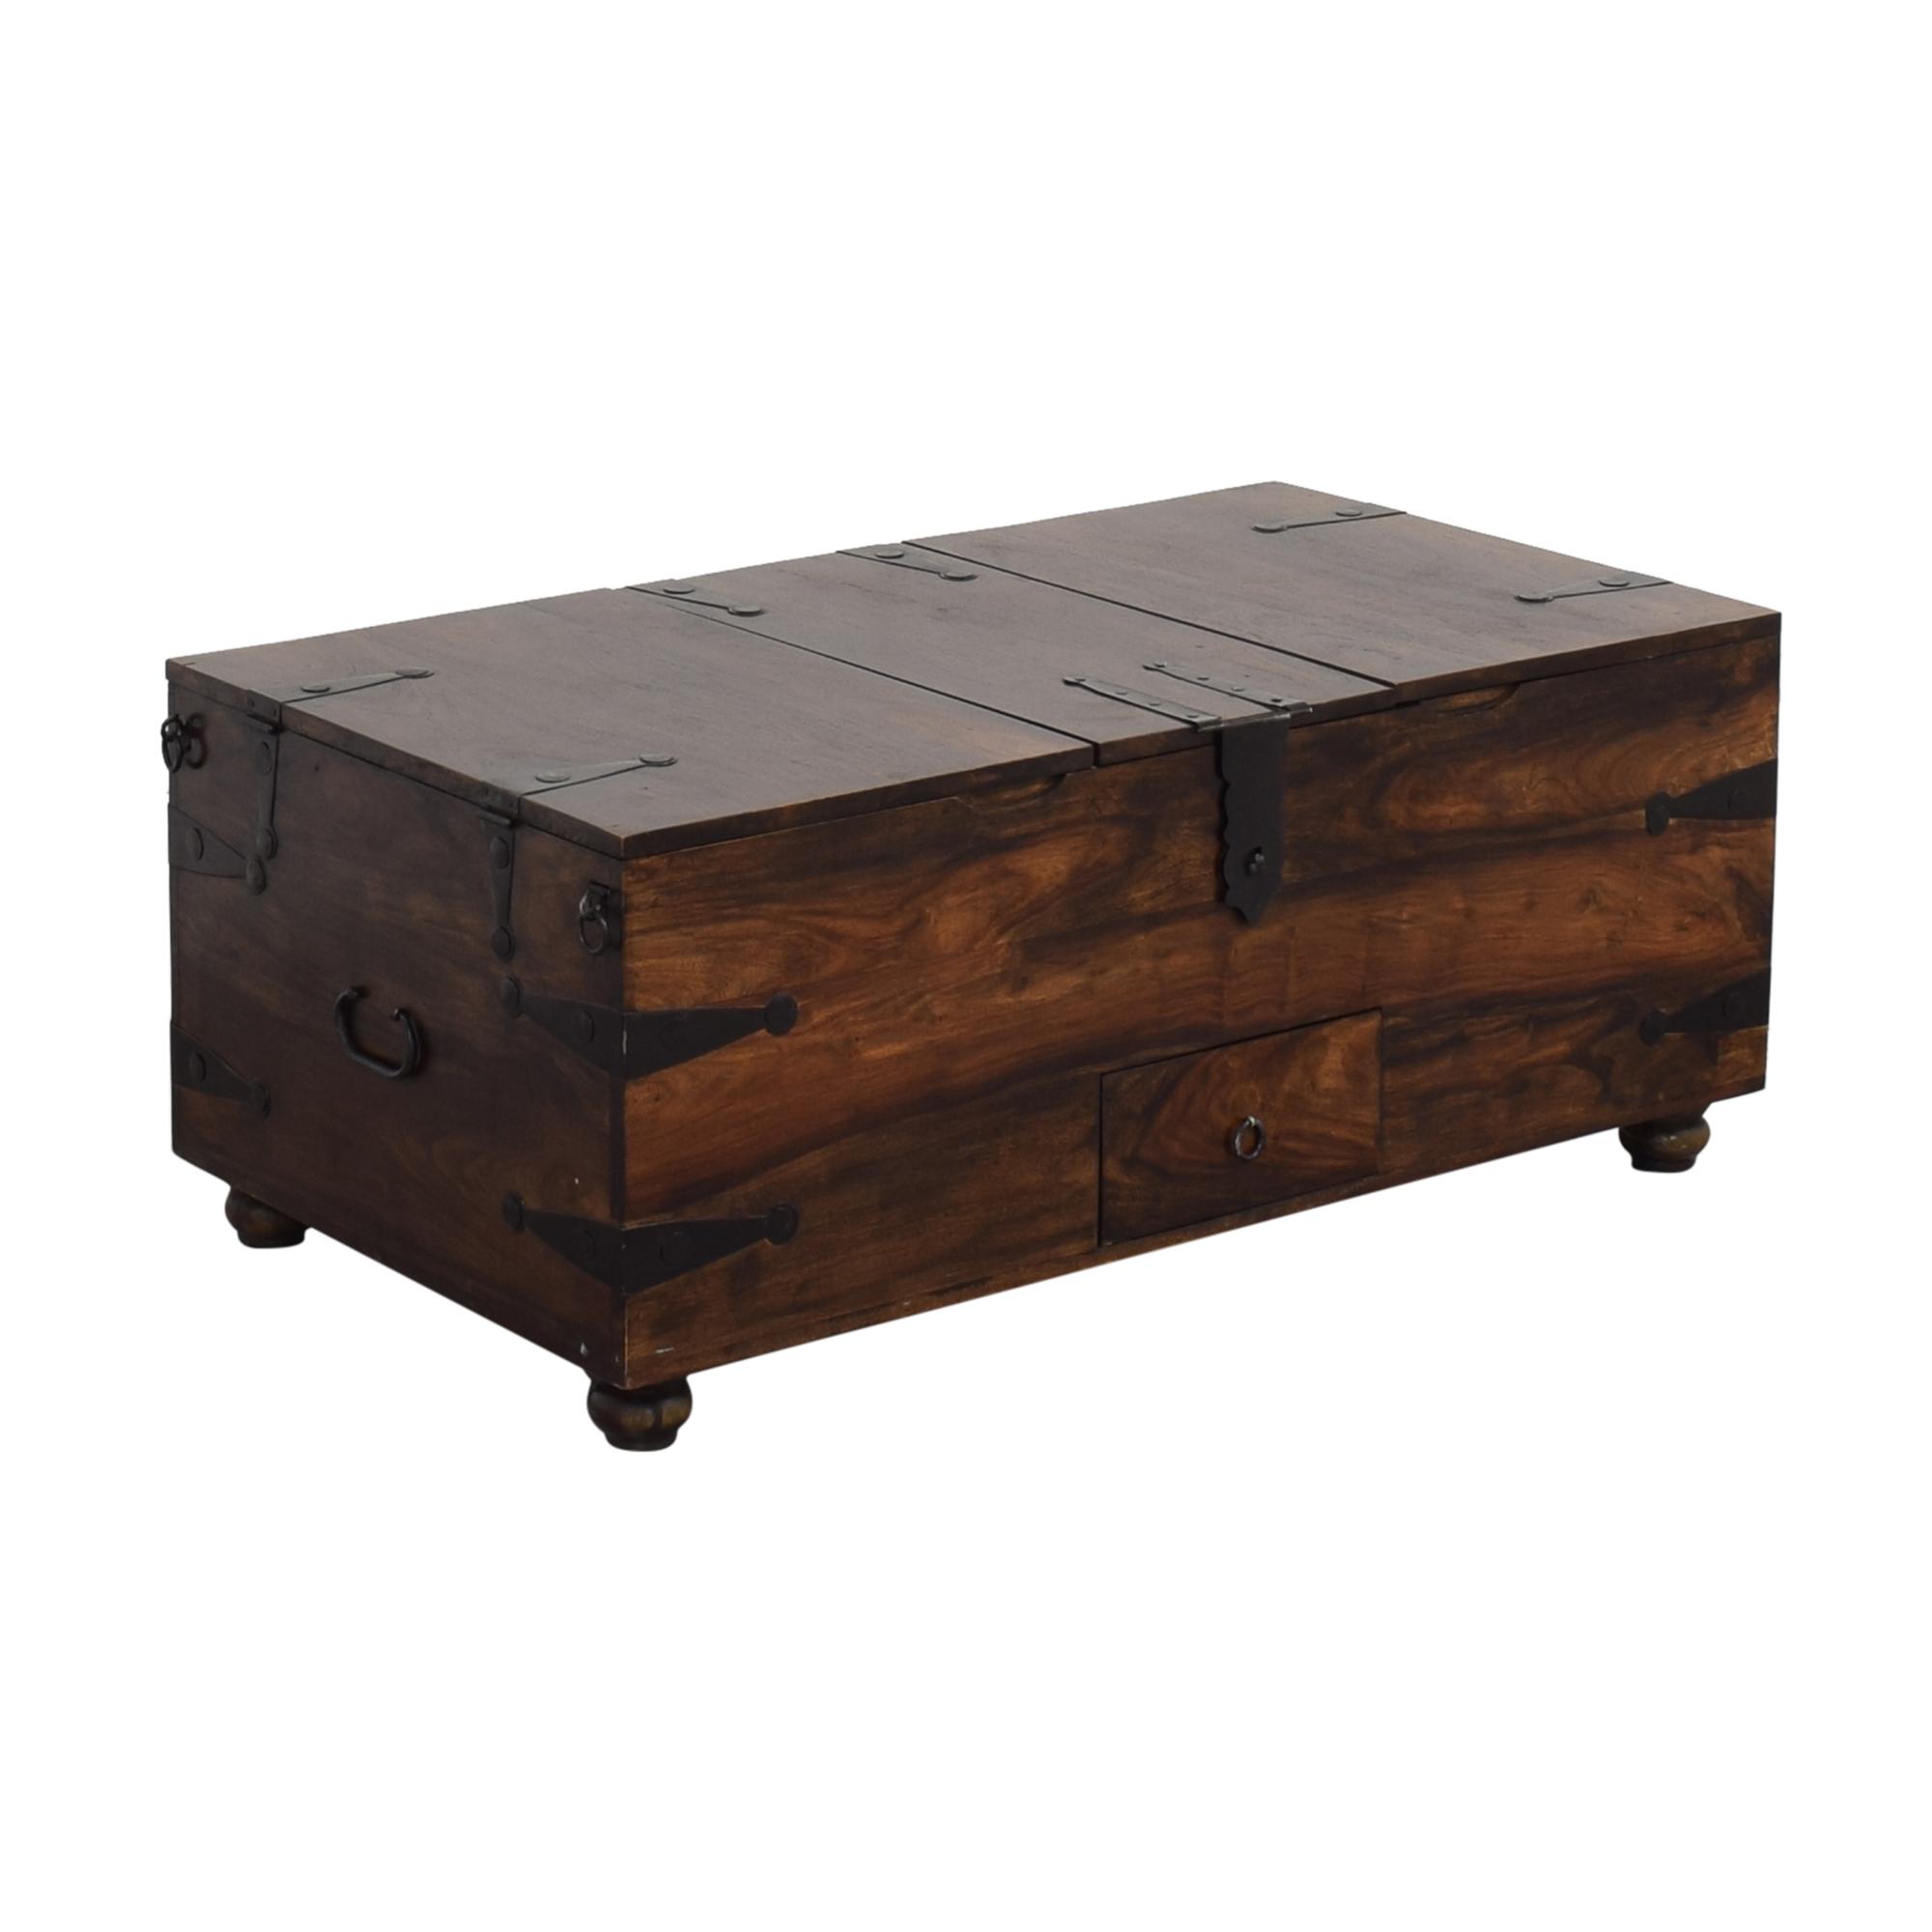 - 56% OFF - Crate & Barrel Crate & Barrel Taka Trunk And Coffee